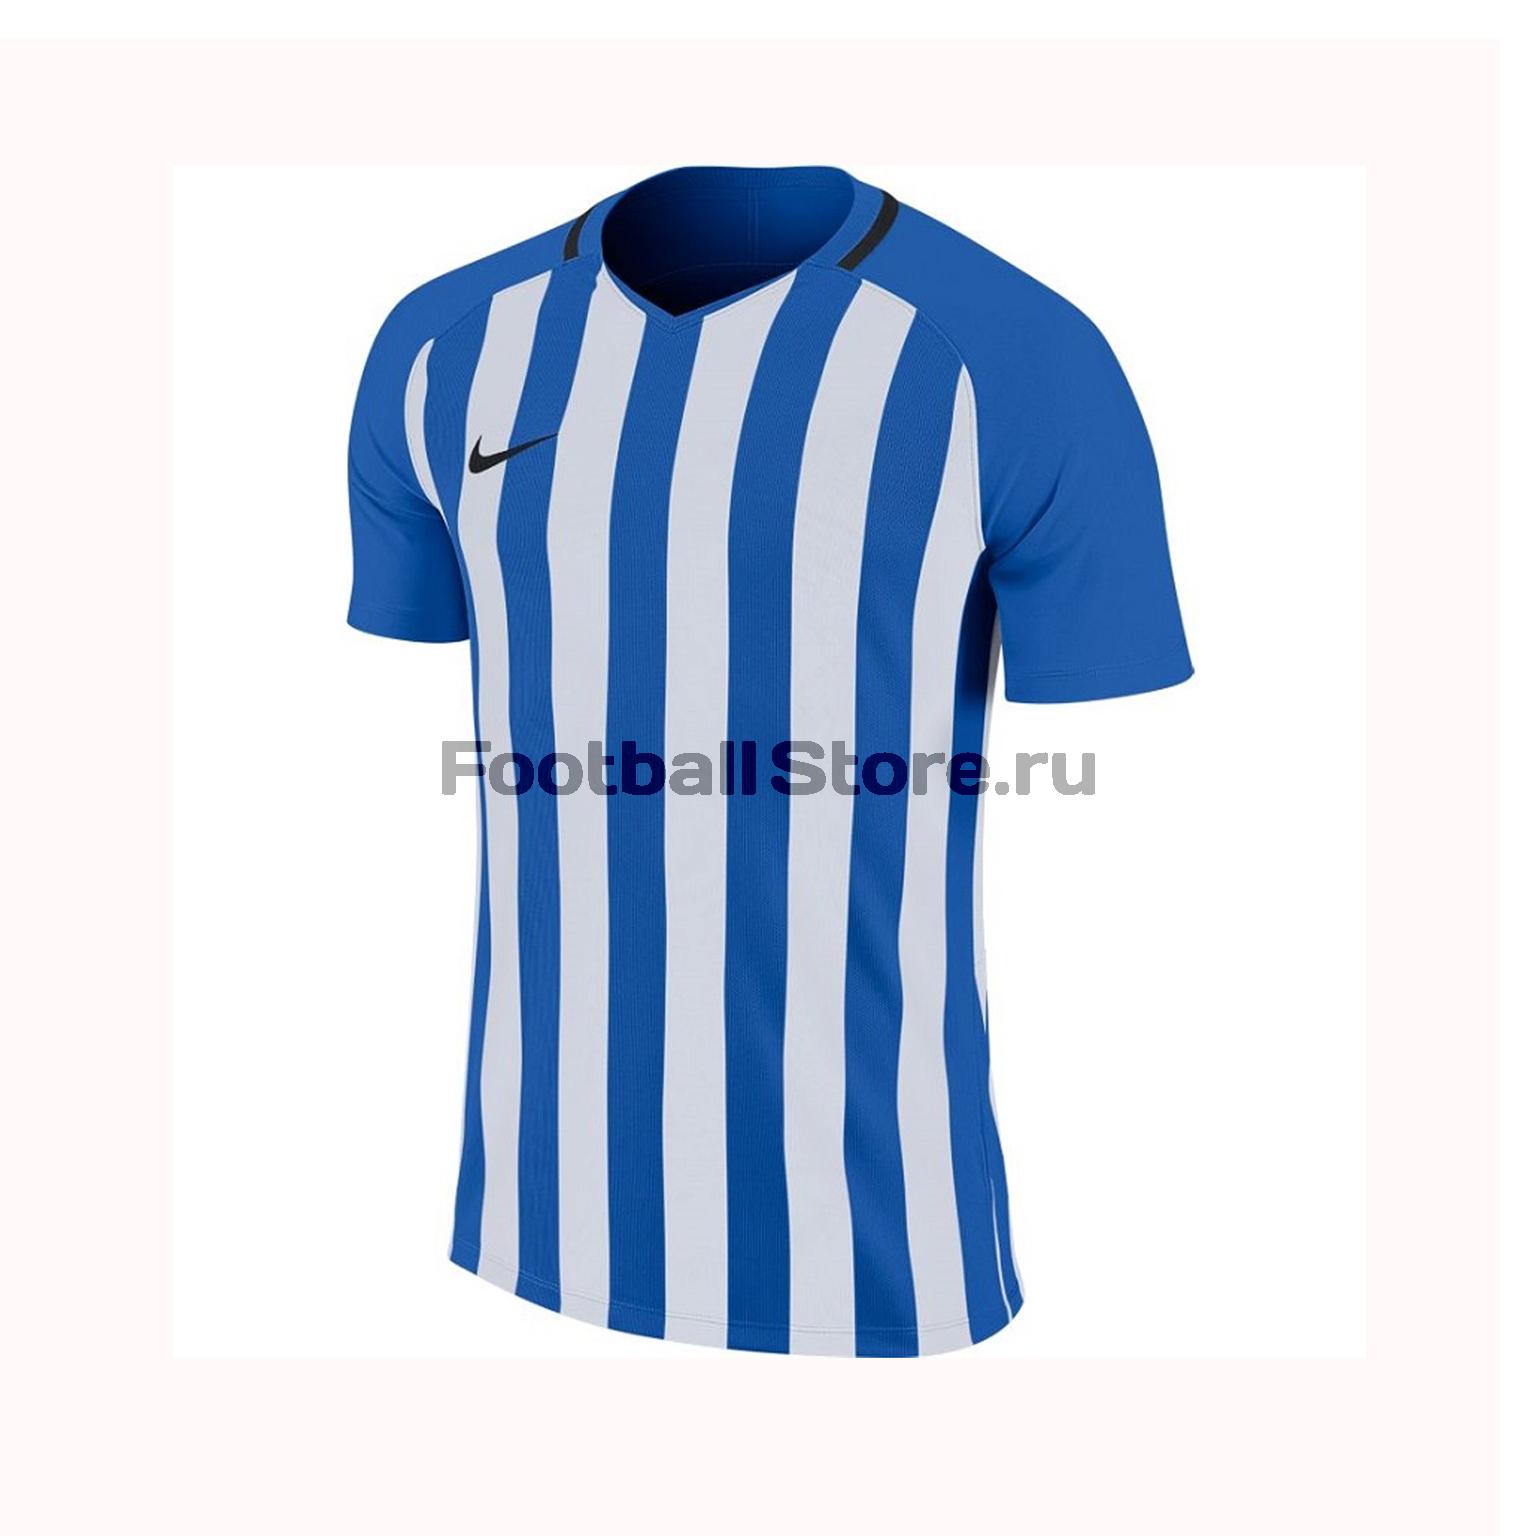 Футболка игровая Nike Striped Division III SS 894081-464 футболка игровая nike dry tiempo prem jsy ss 894230 411